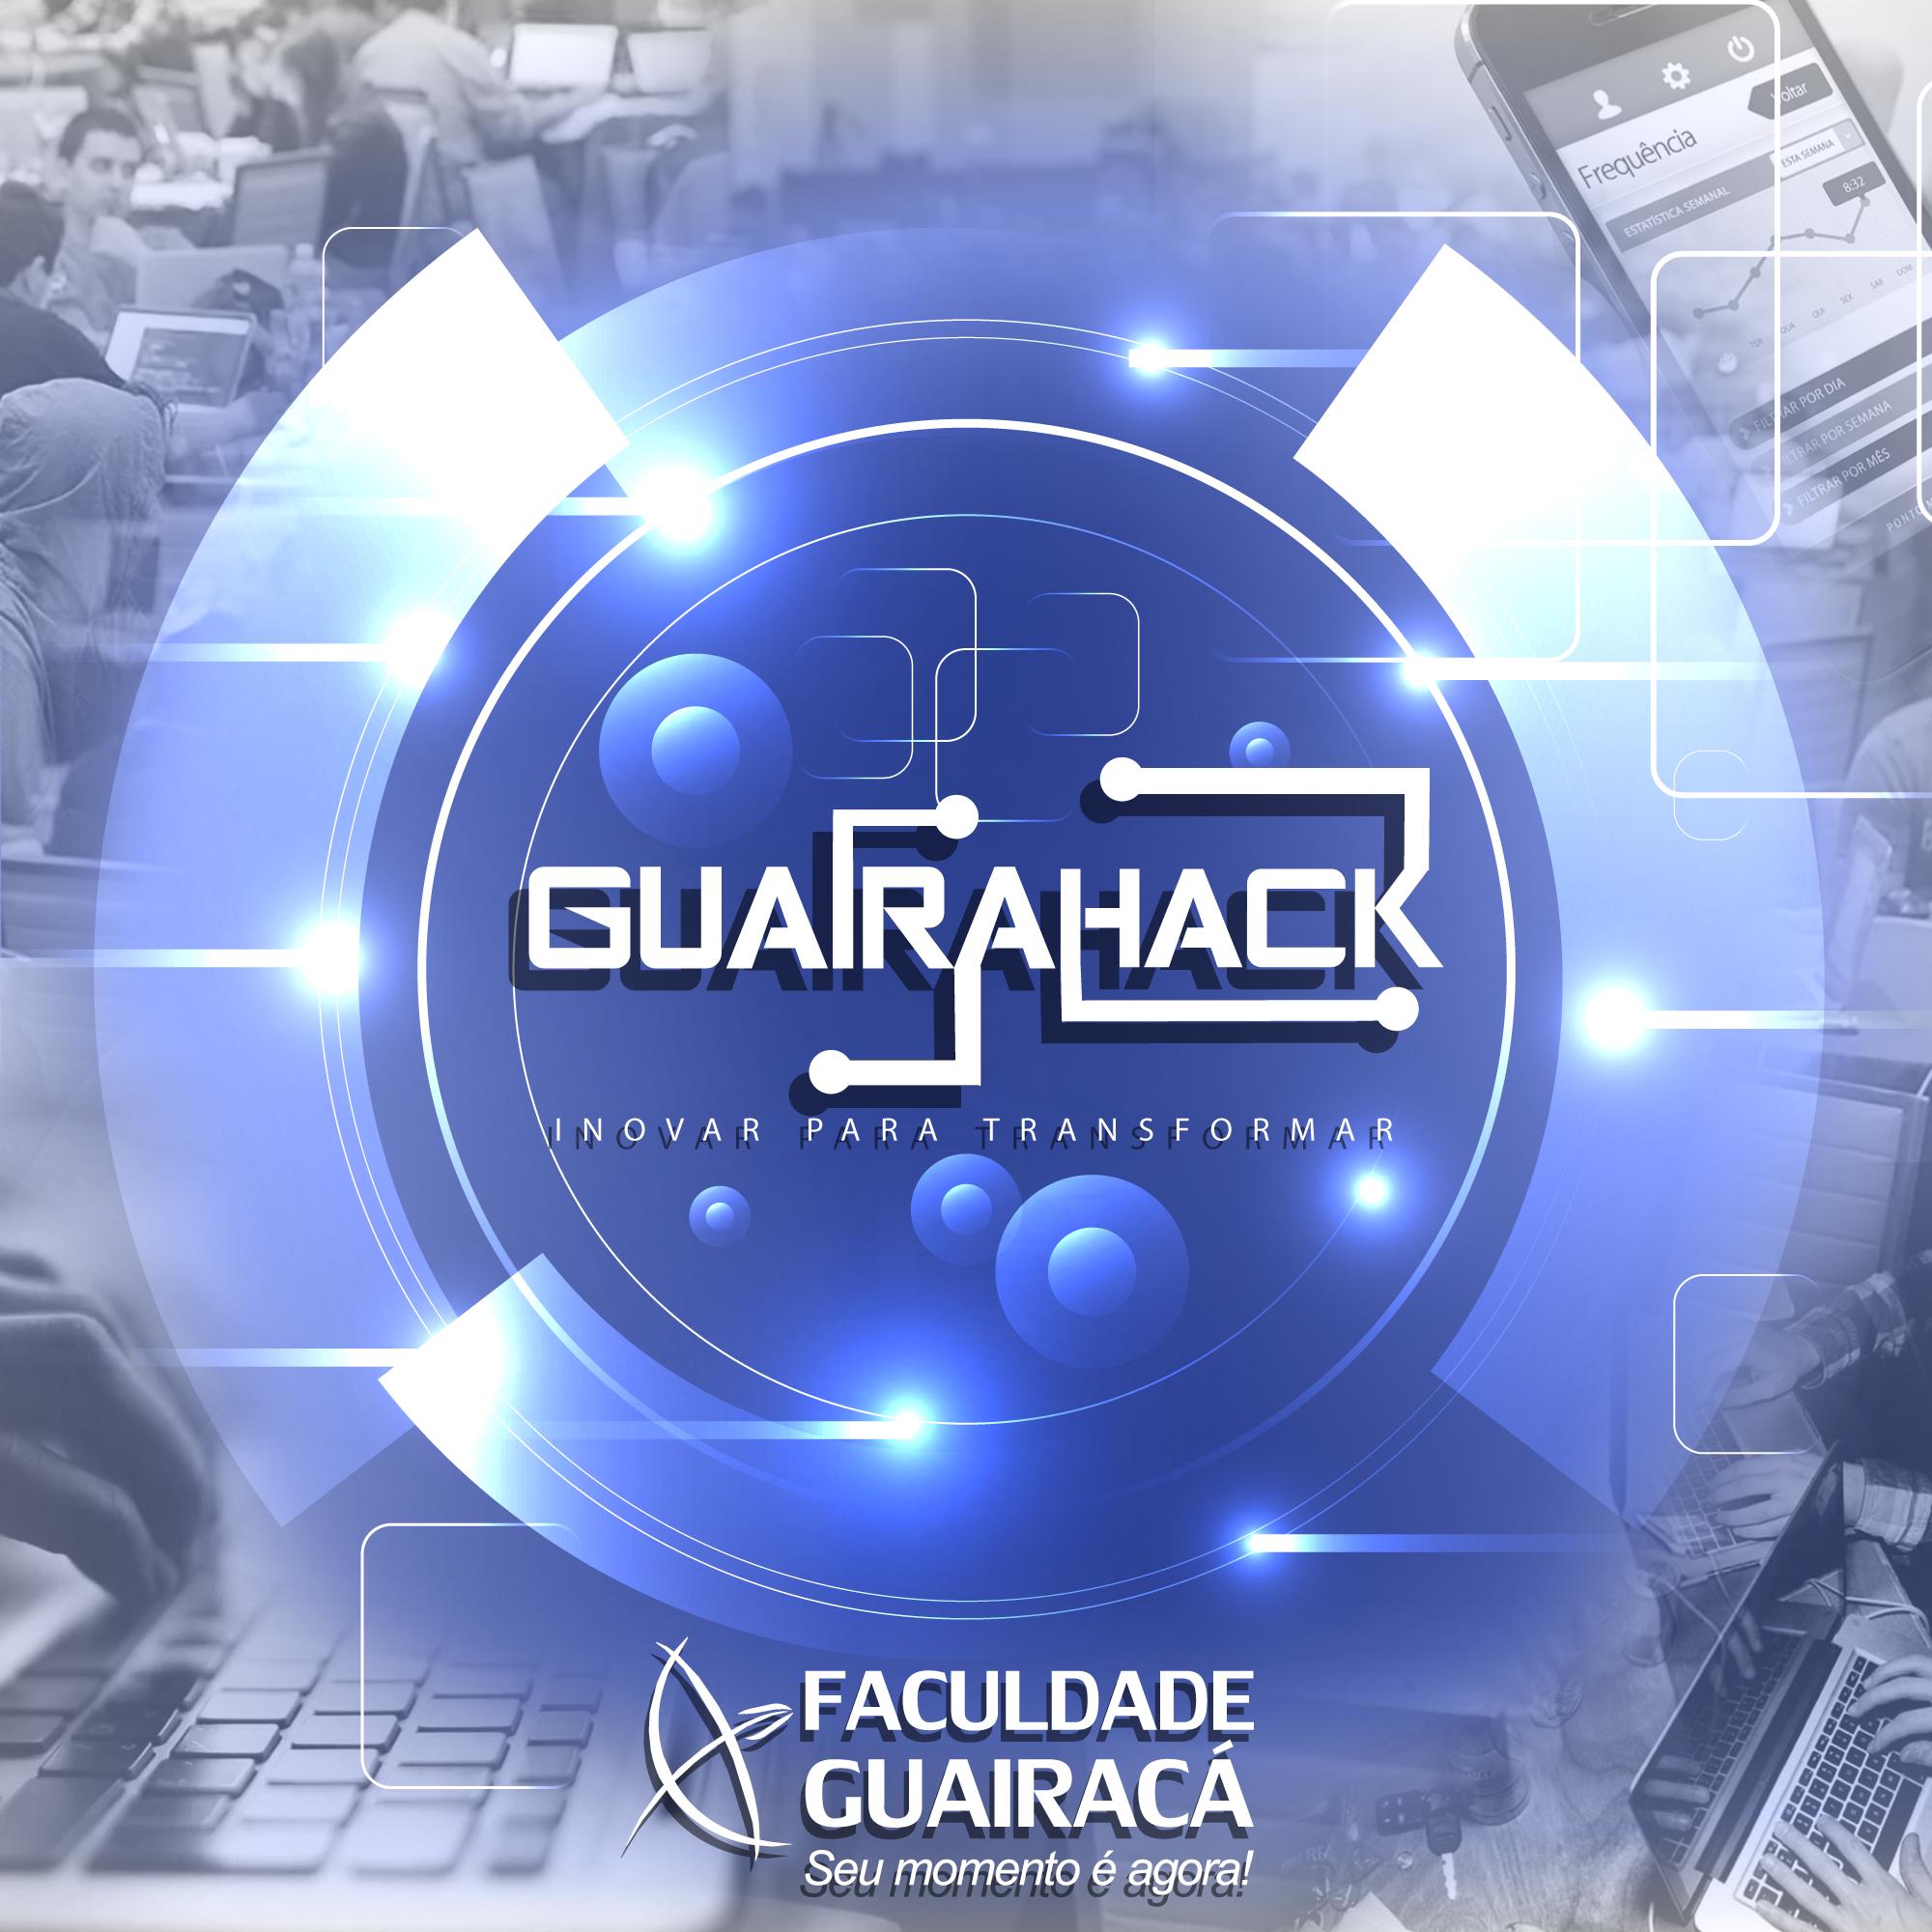 Guairahack